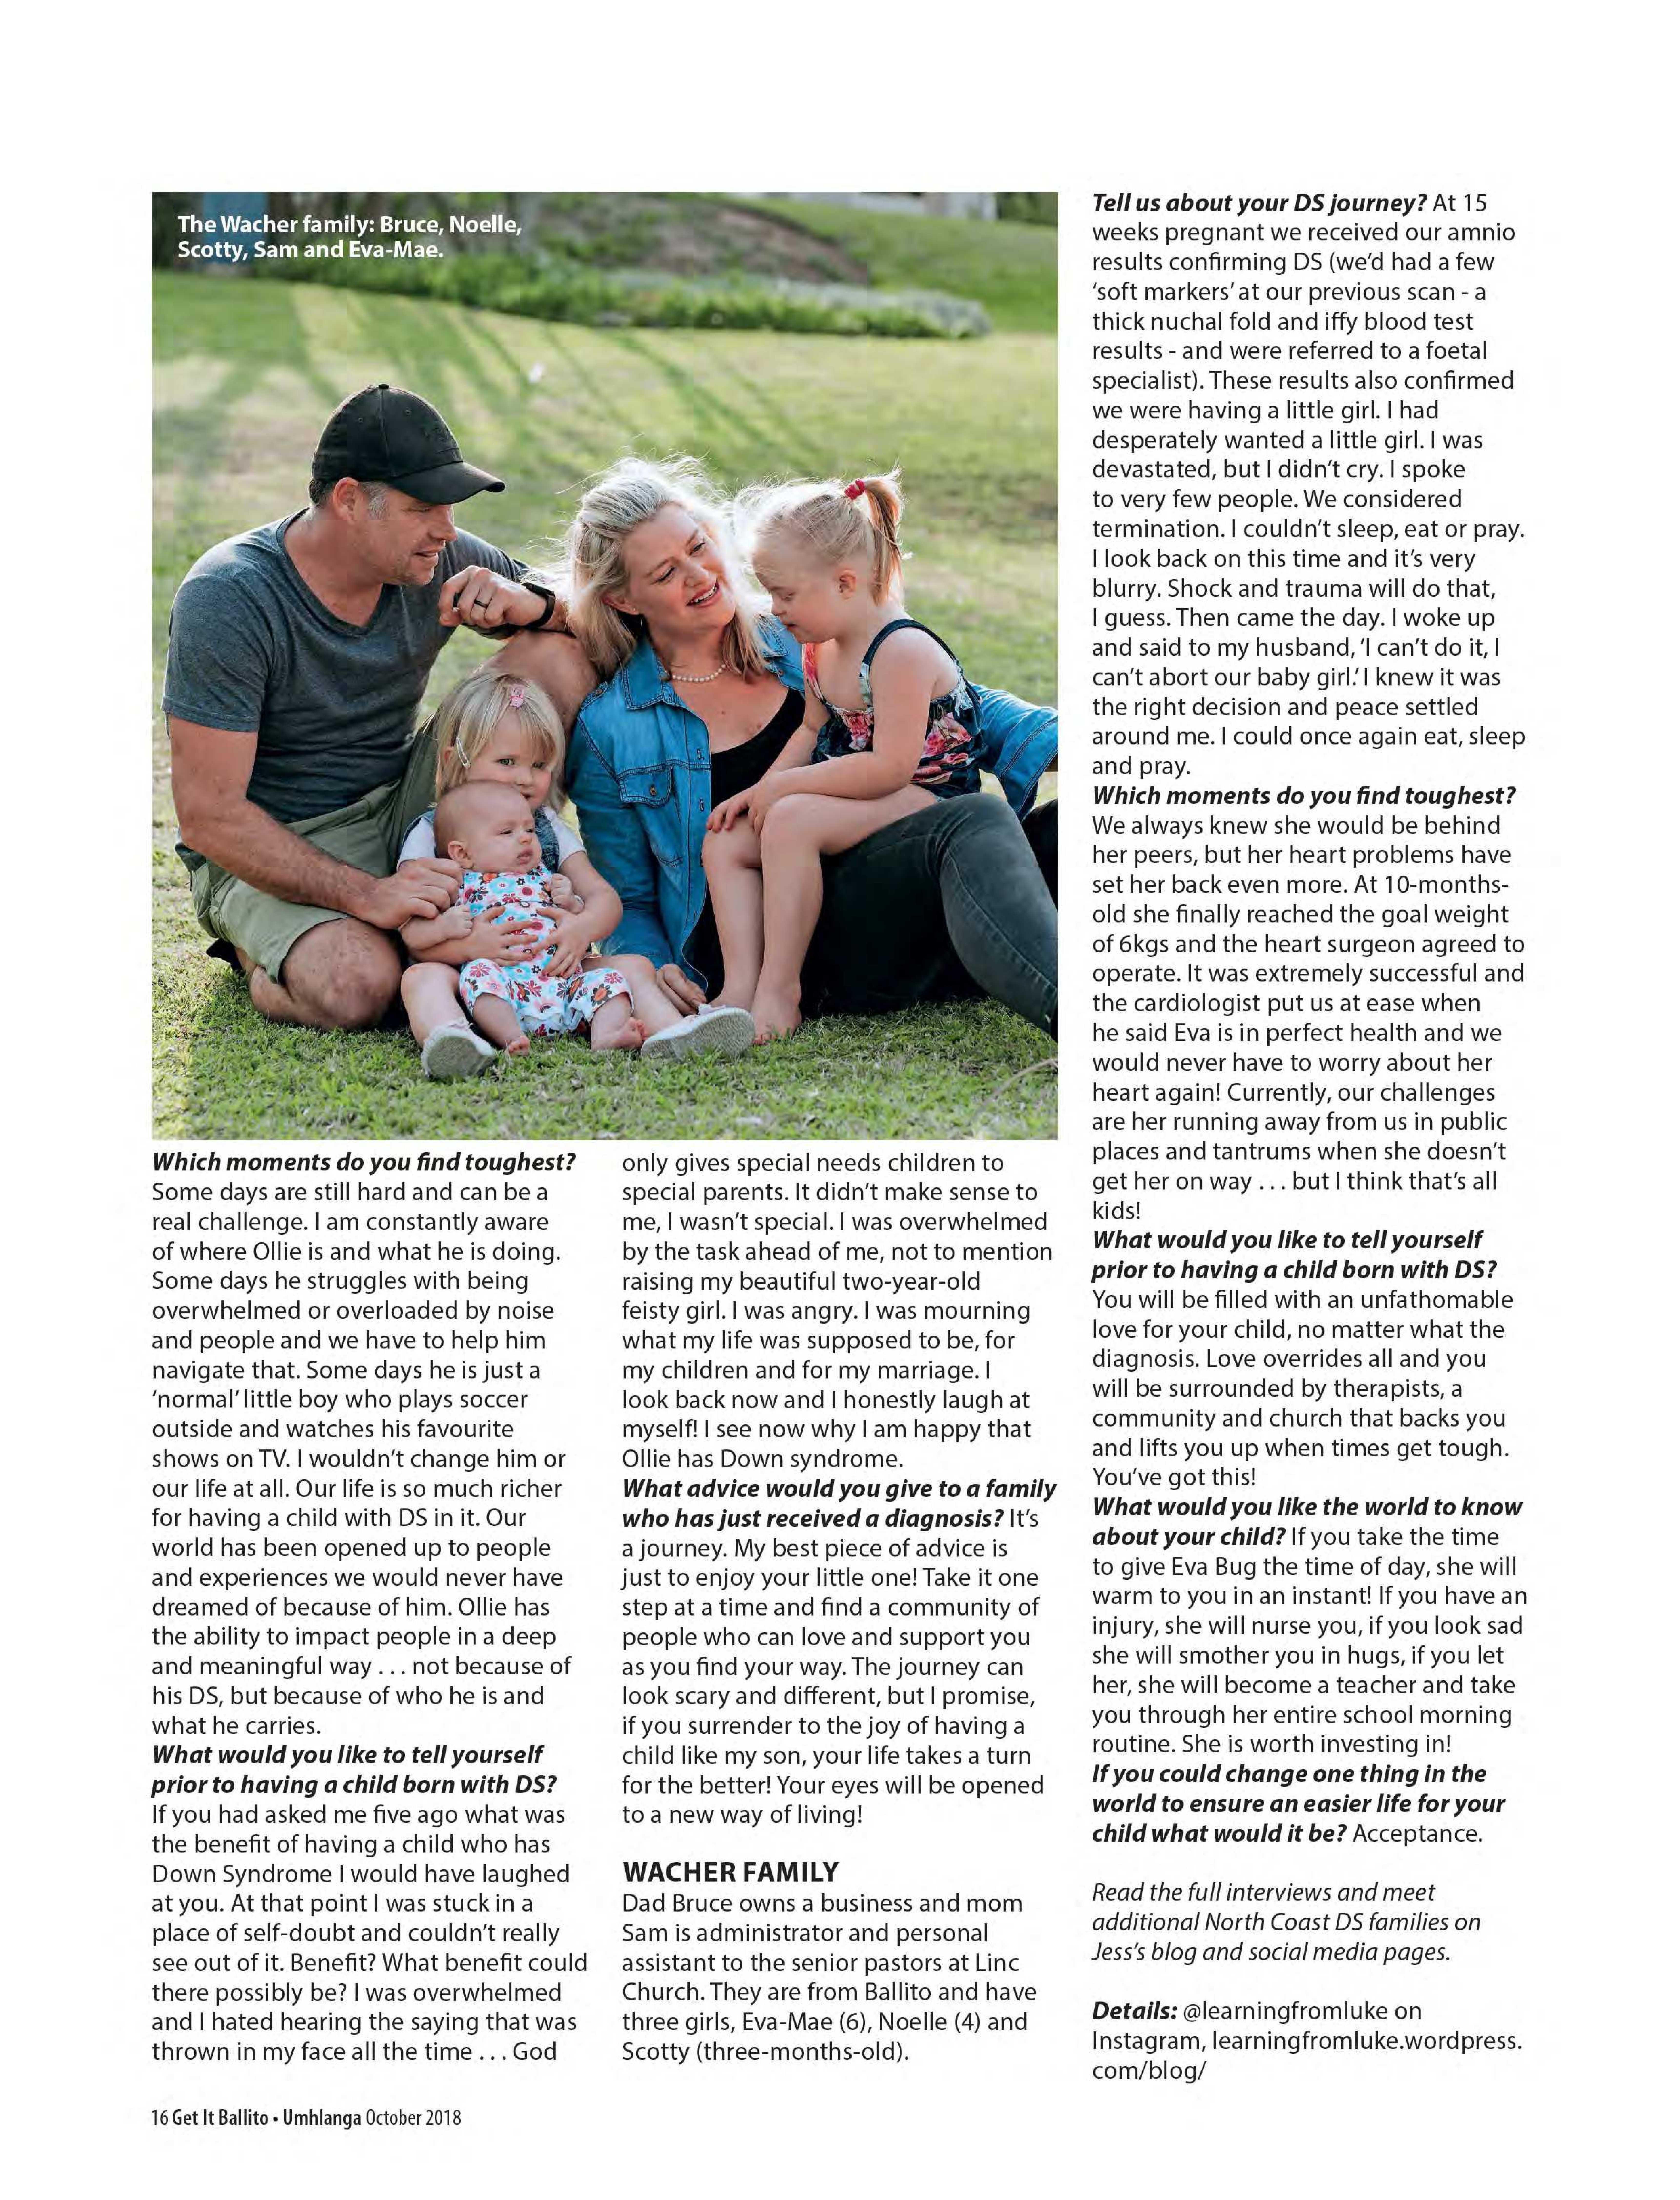 get-magazine-ballitoumhlanga-october-2018-epapers-page-18